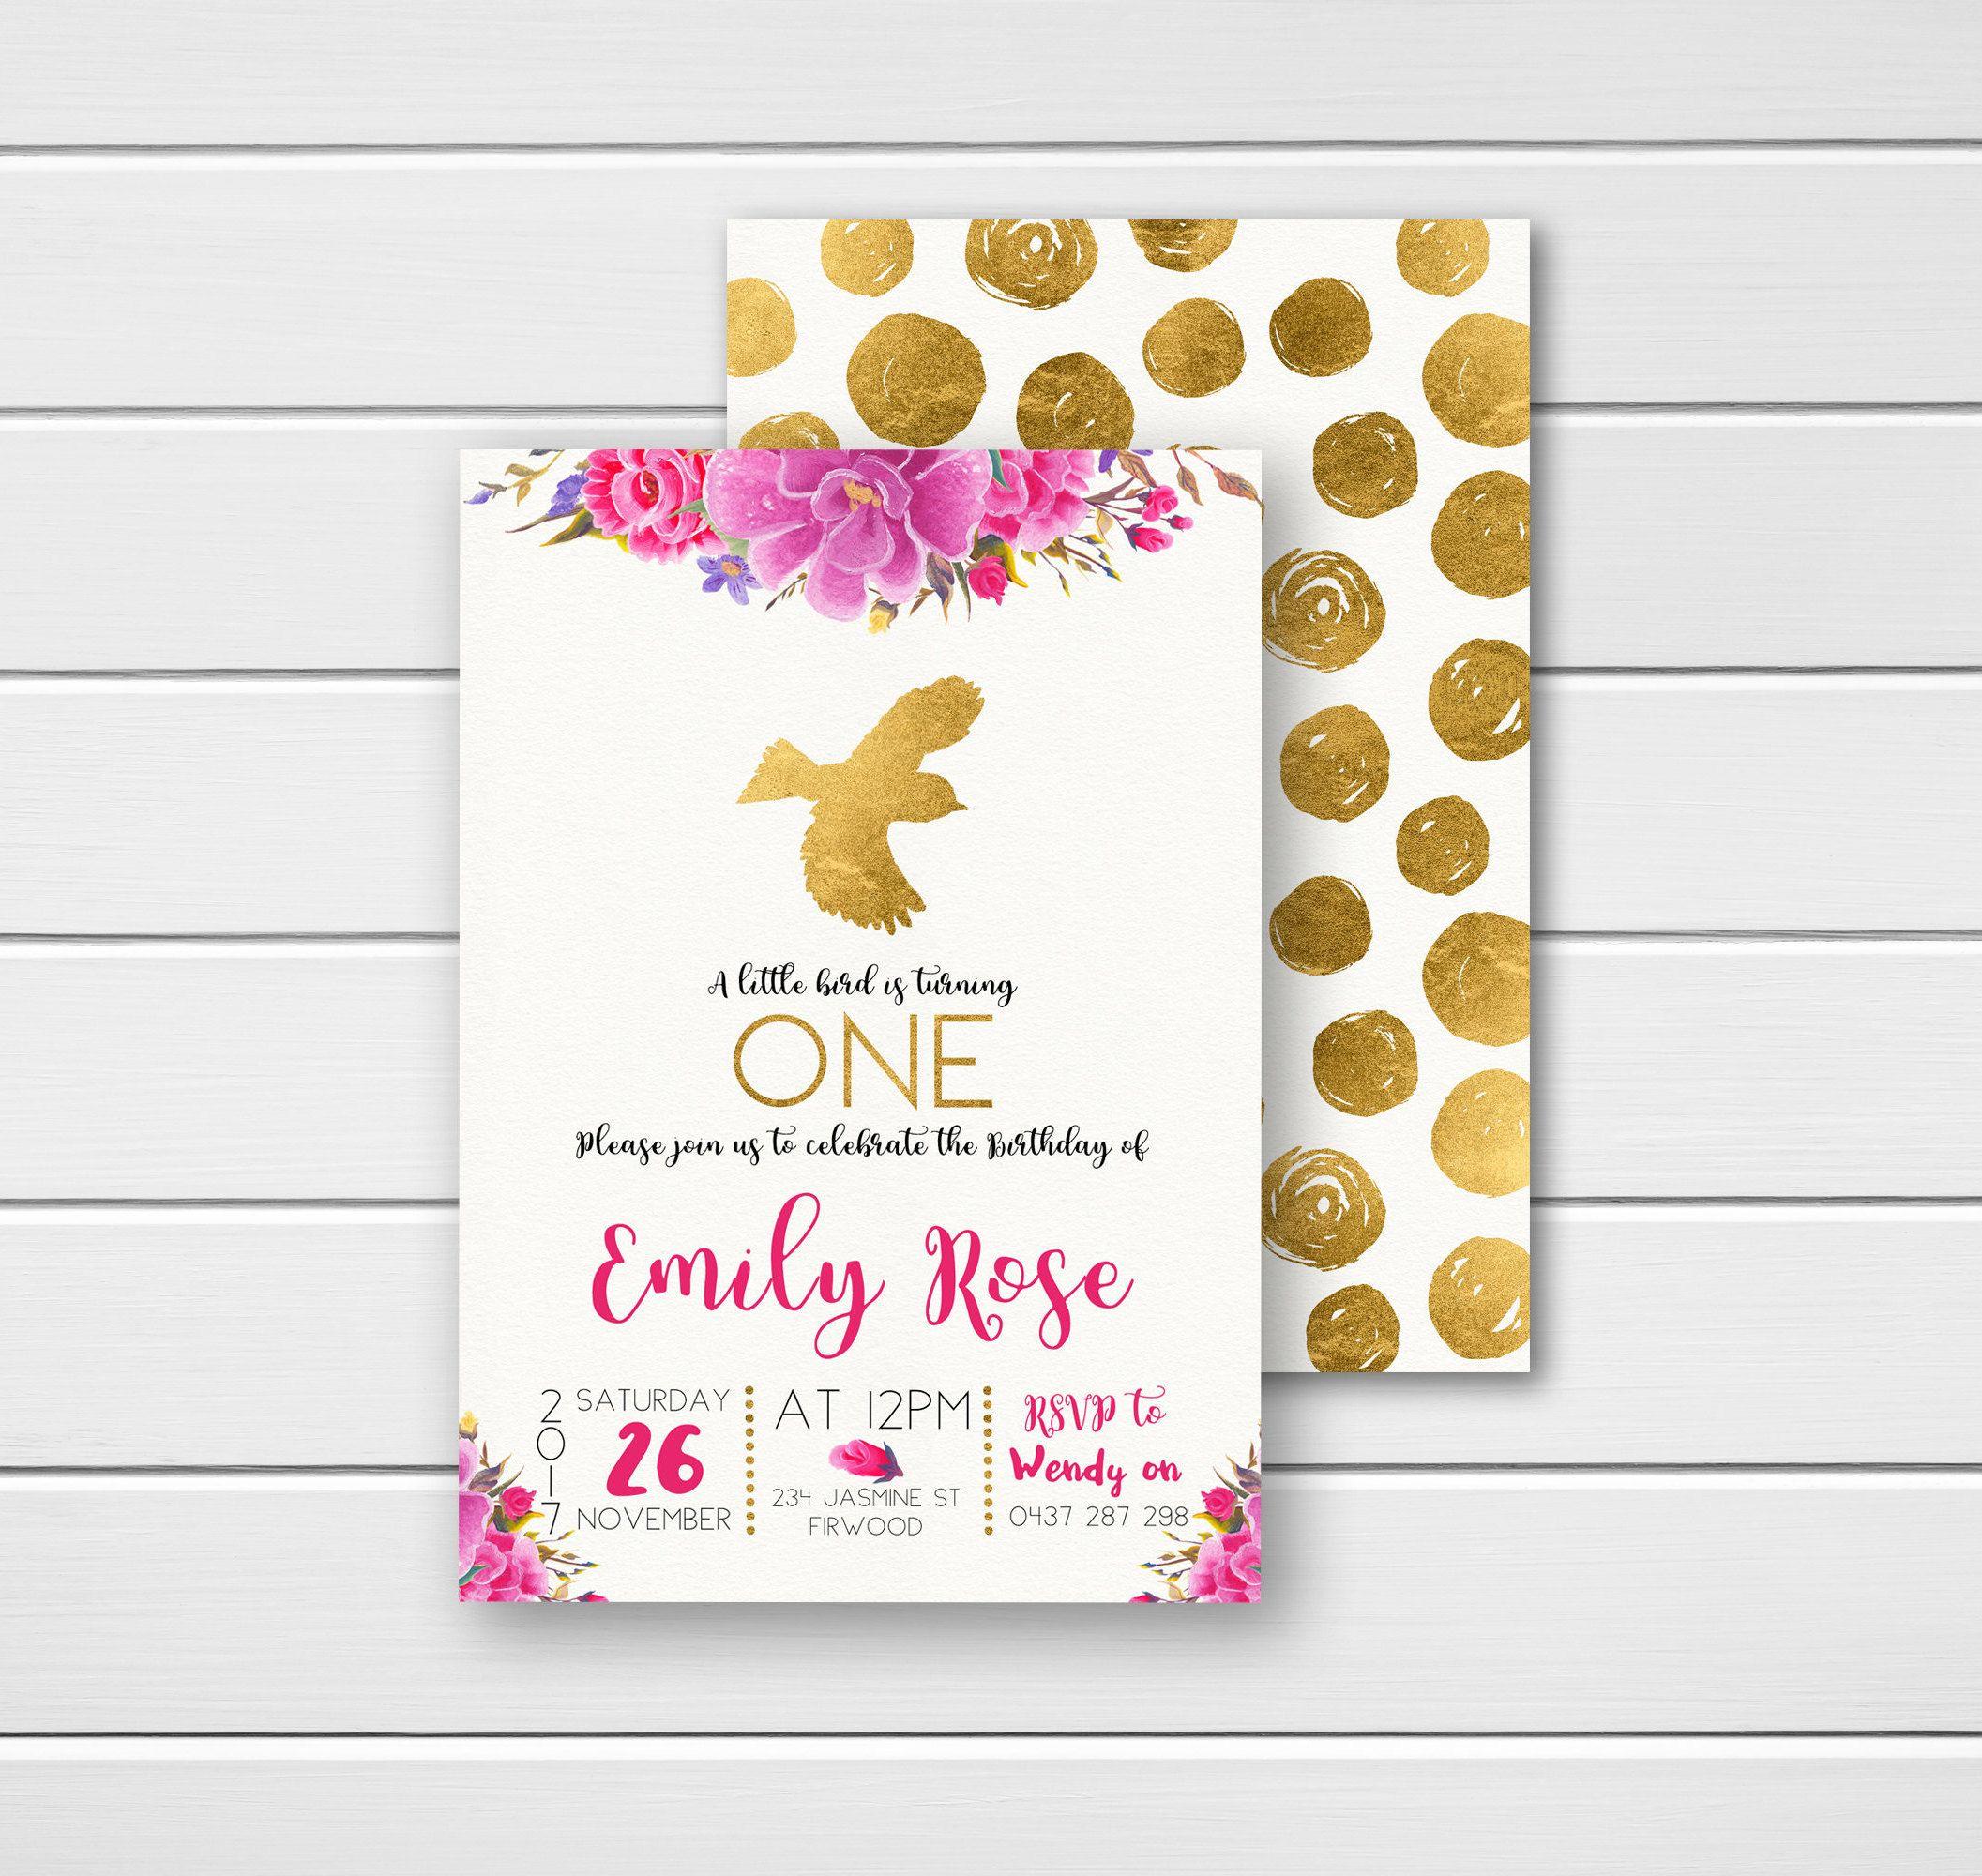 Pink Birthday Invites, Birthday Invitations, Pink And Gold, 1St Birthday